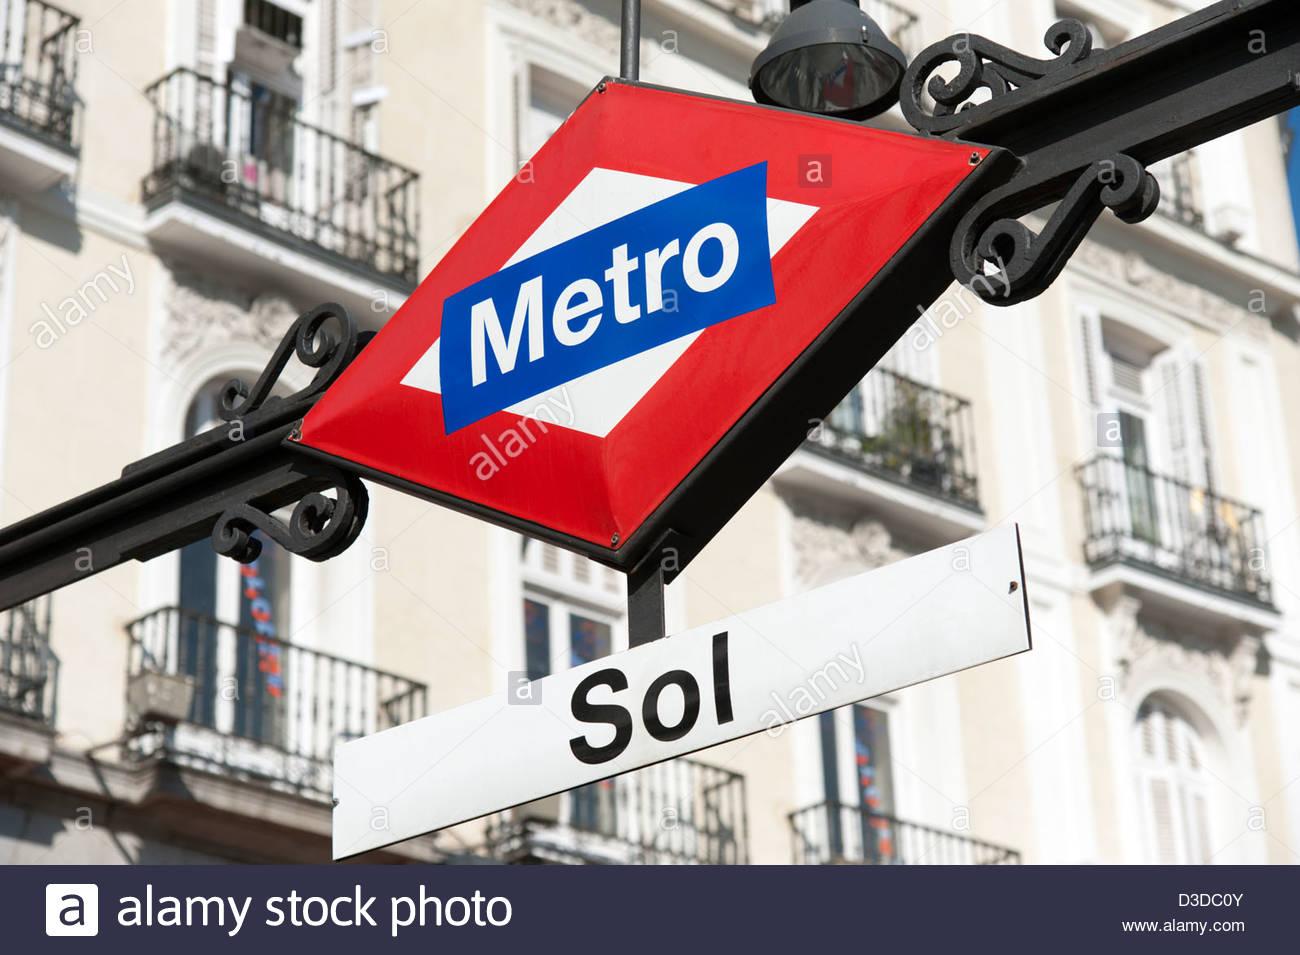 Sol metro station sign, Madrid, Spain - Stock Image